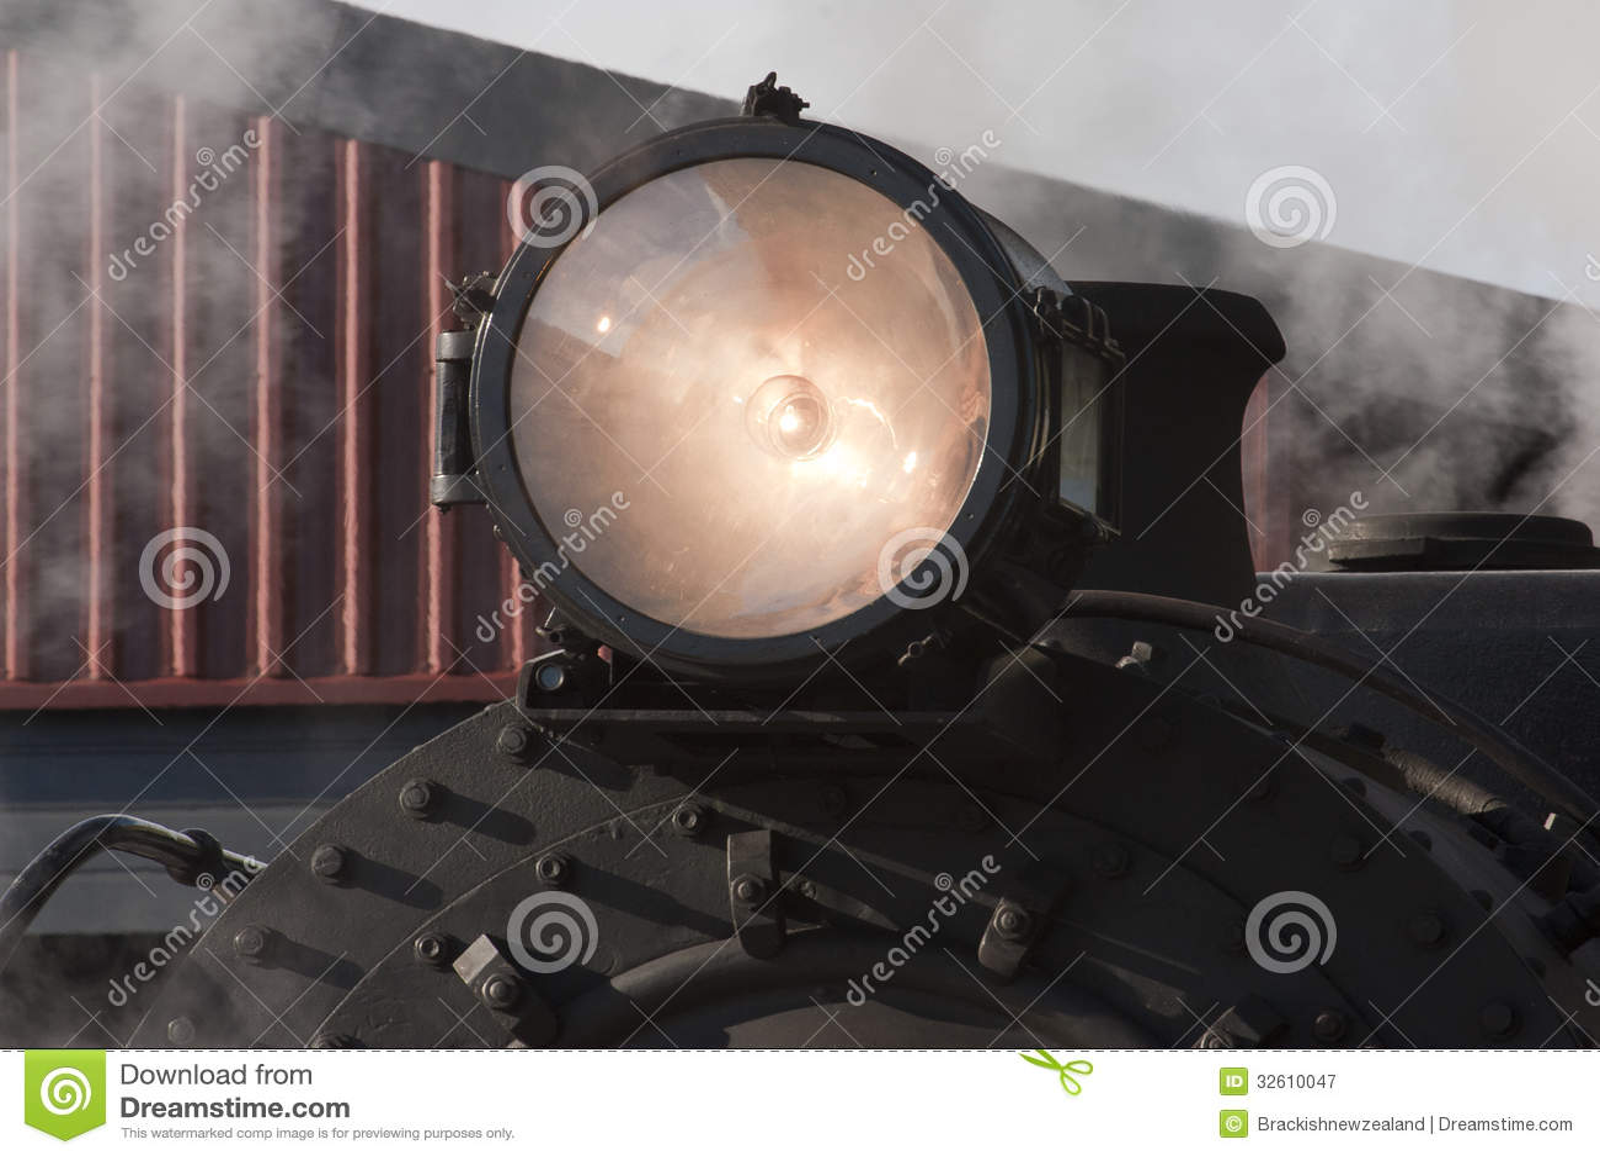 Antique Train Headlight : Steam train headlight stock image of bolts